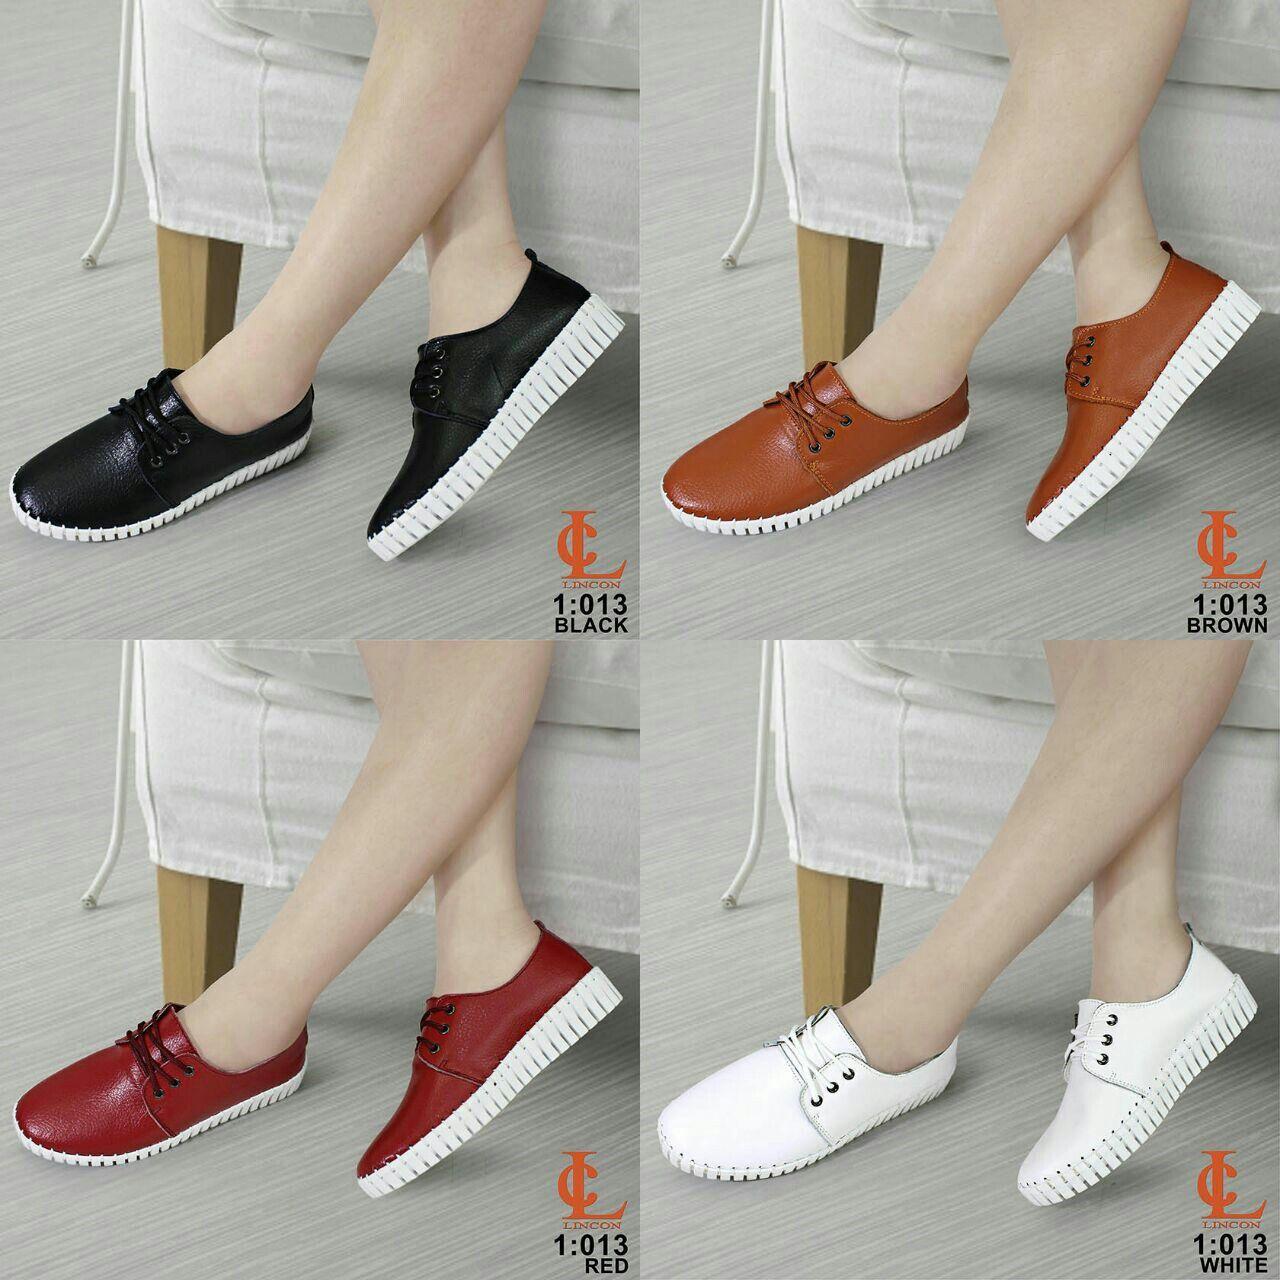 Sepatu Lincon 013 Original Brand Bahan Kulit Asli Hight Site 3cm